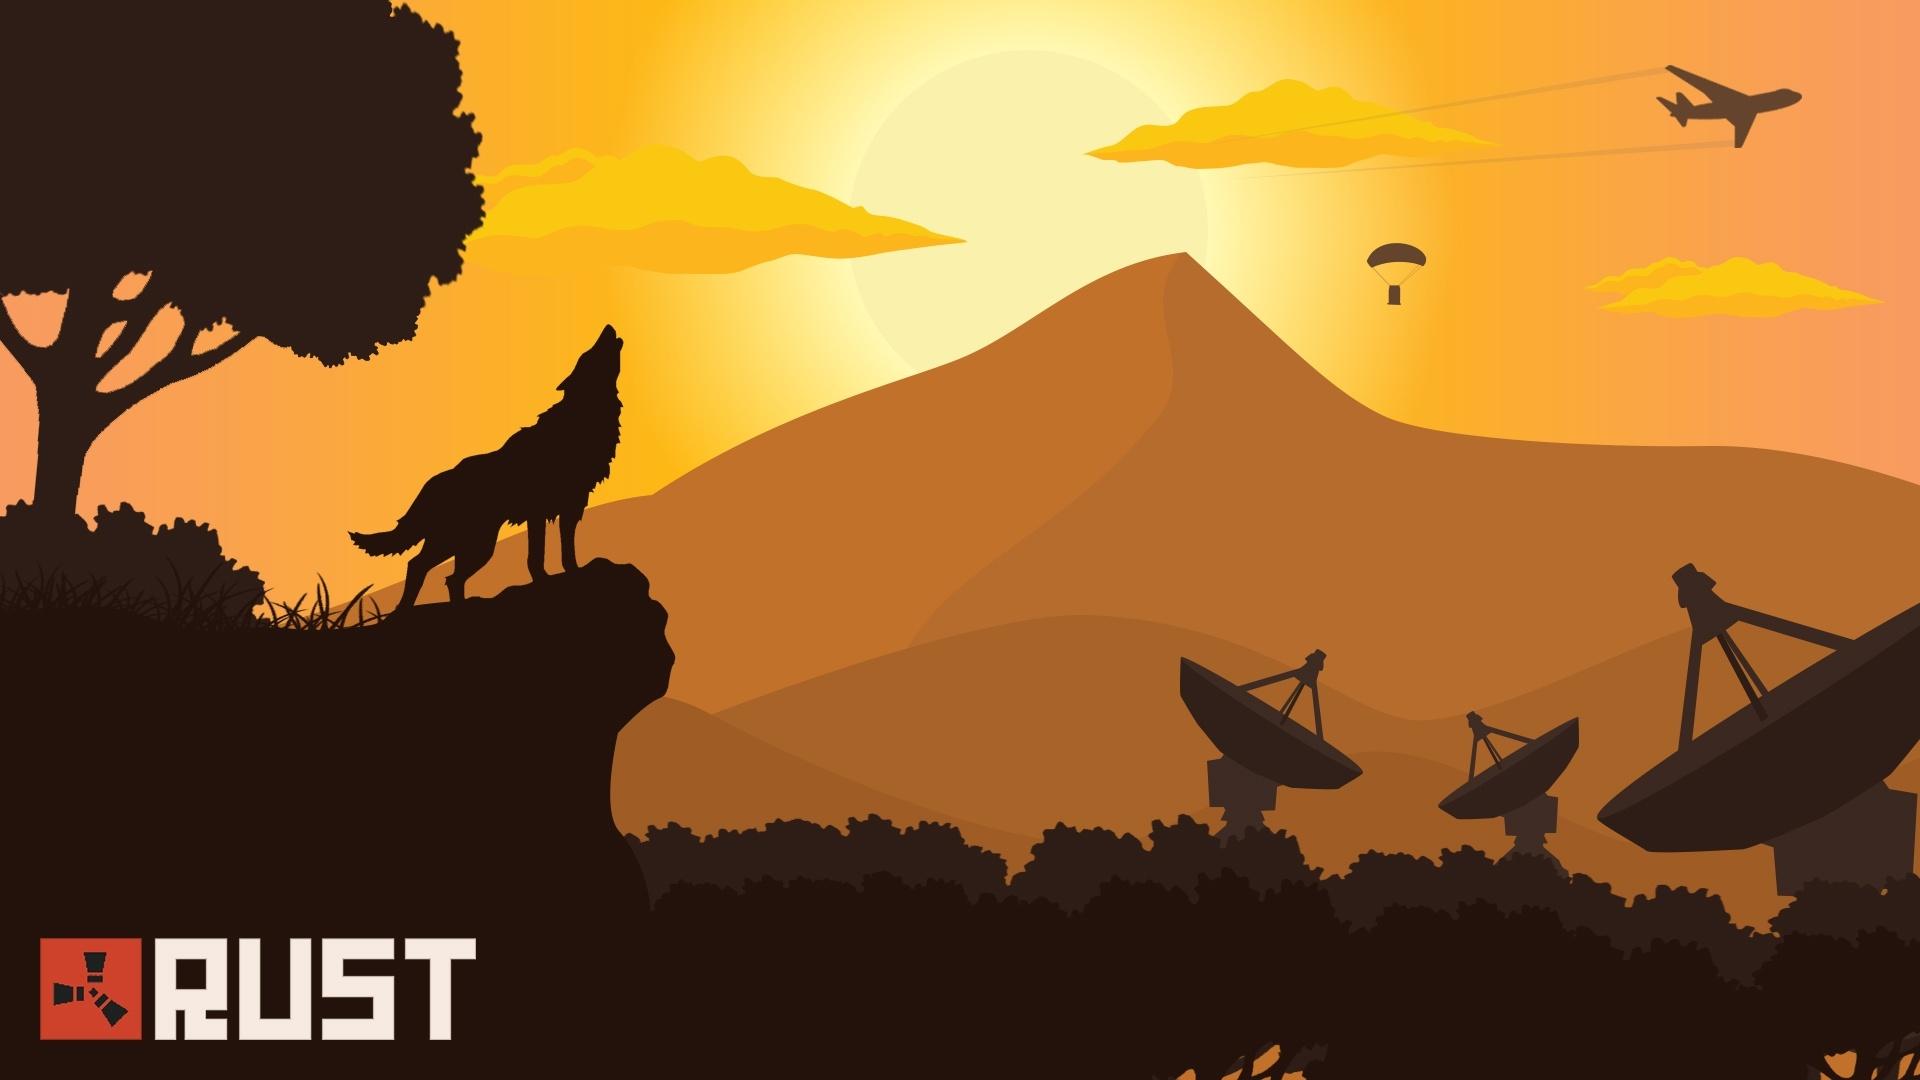 Rust desktop wallpaper free download